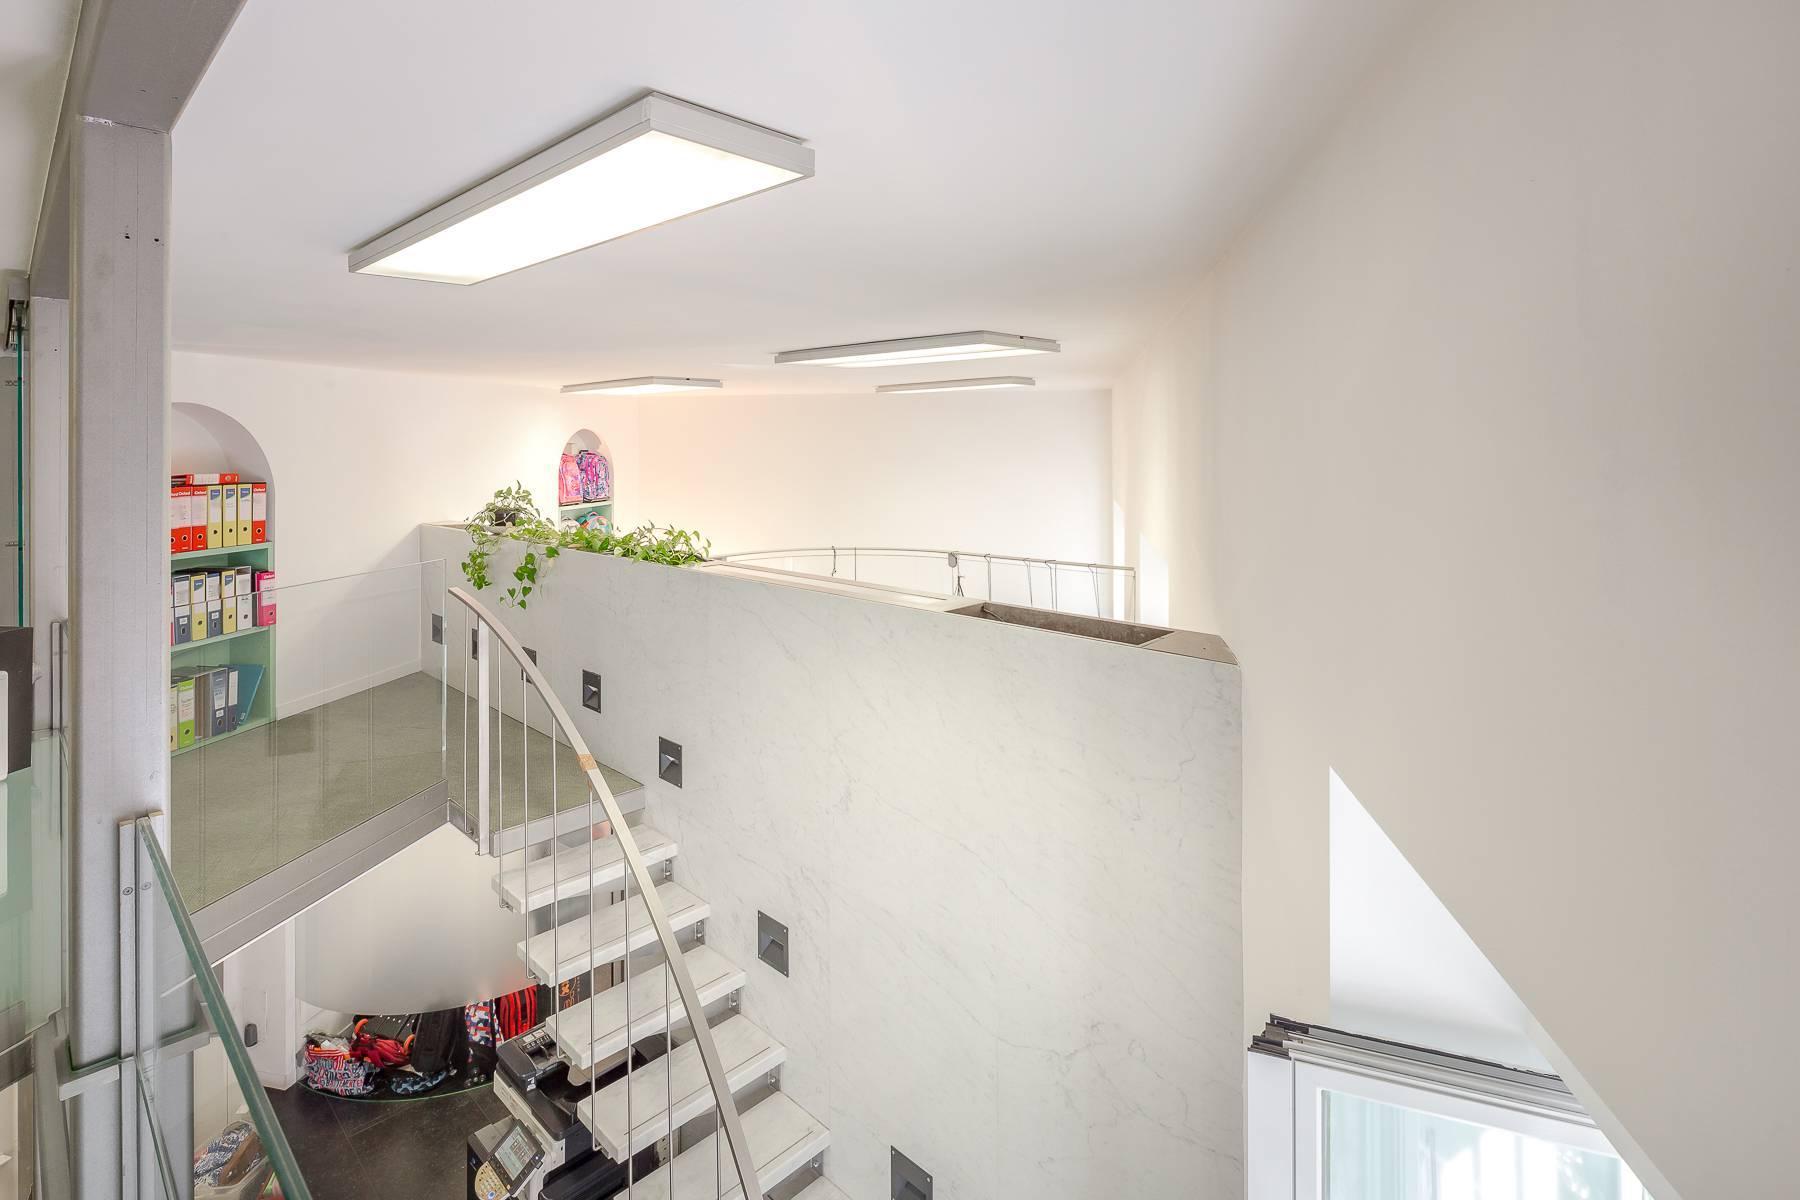 Opne-Space Büro / Wohnimmobilie auf der Piazza Giovine Italia / Via Aurelio Saffi - 15